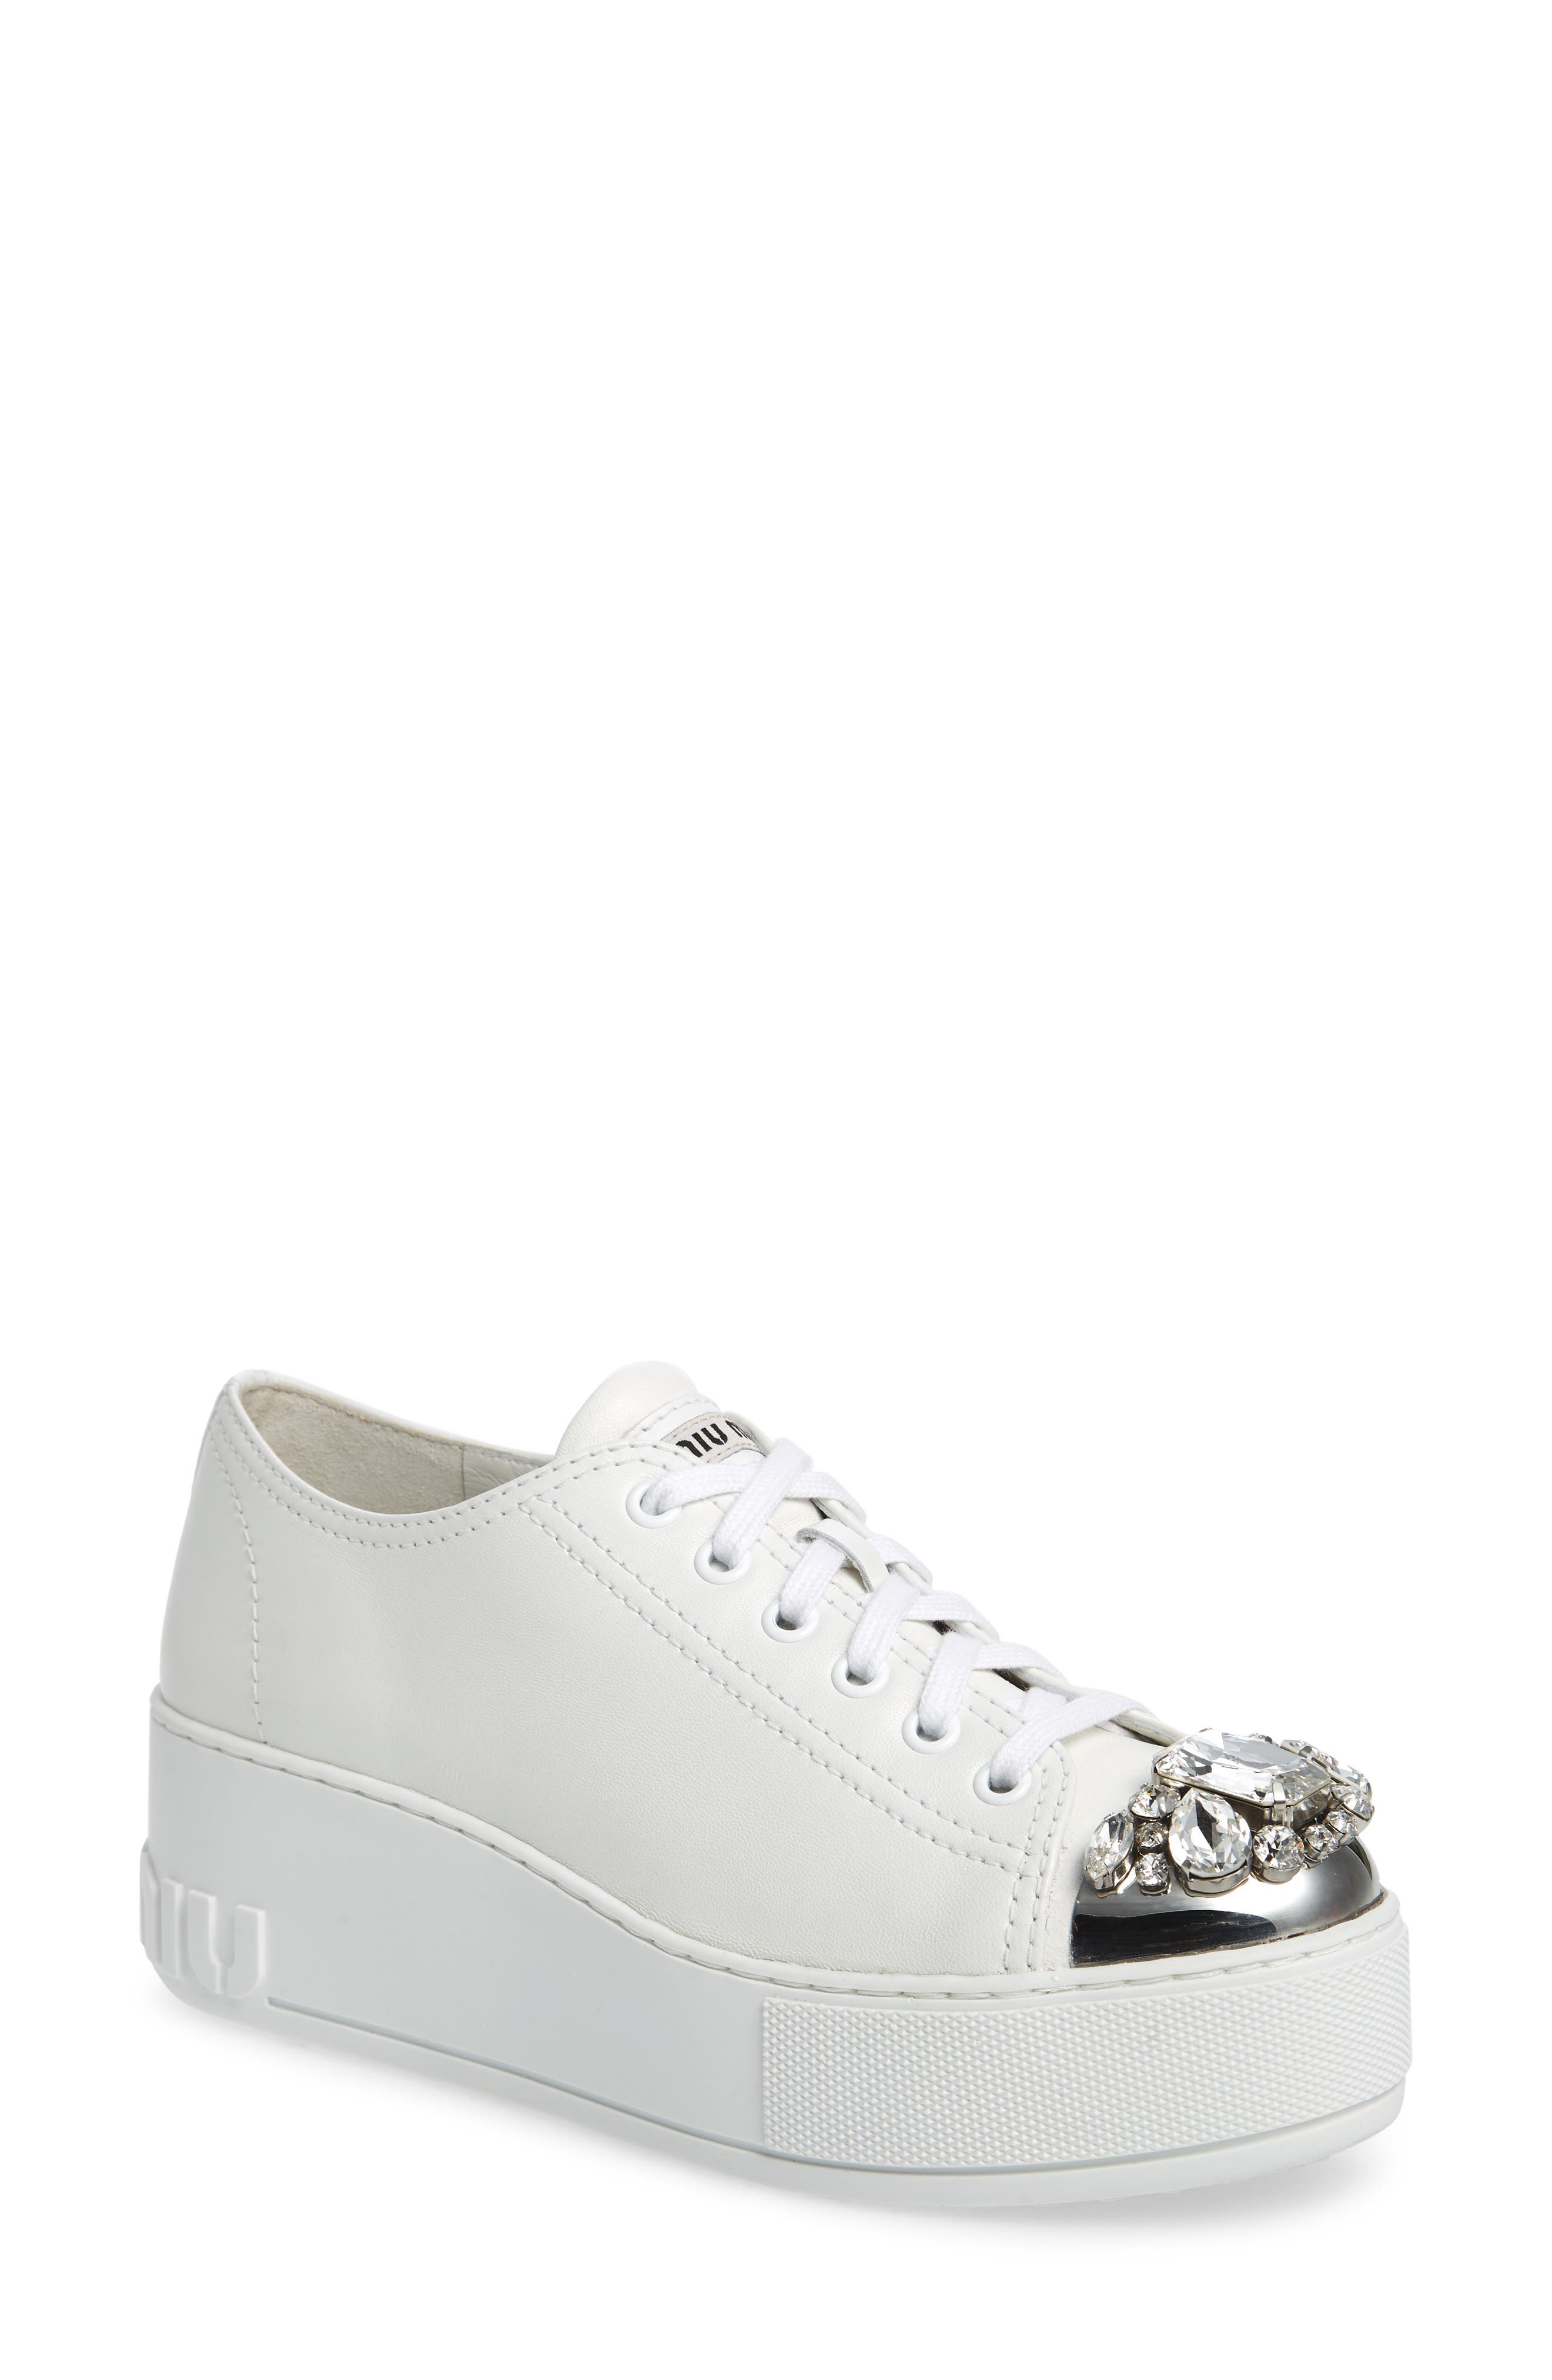 Crystal Cap Toe Sneaker,                             Main thumbnail 1, color,                             White